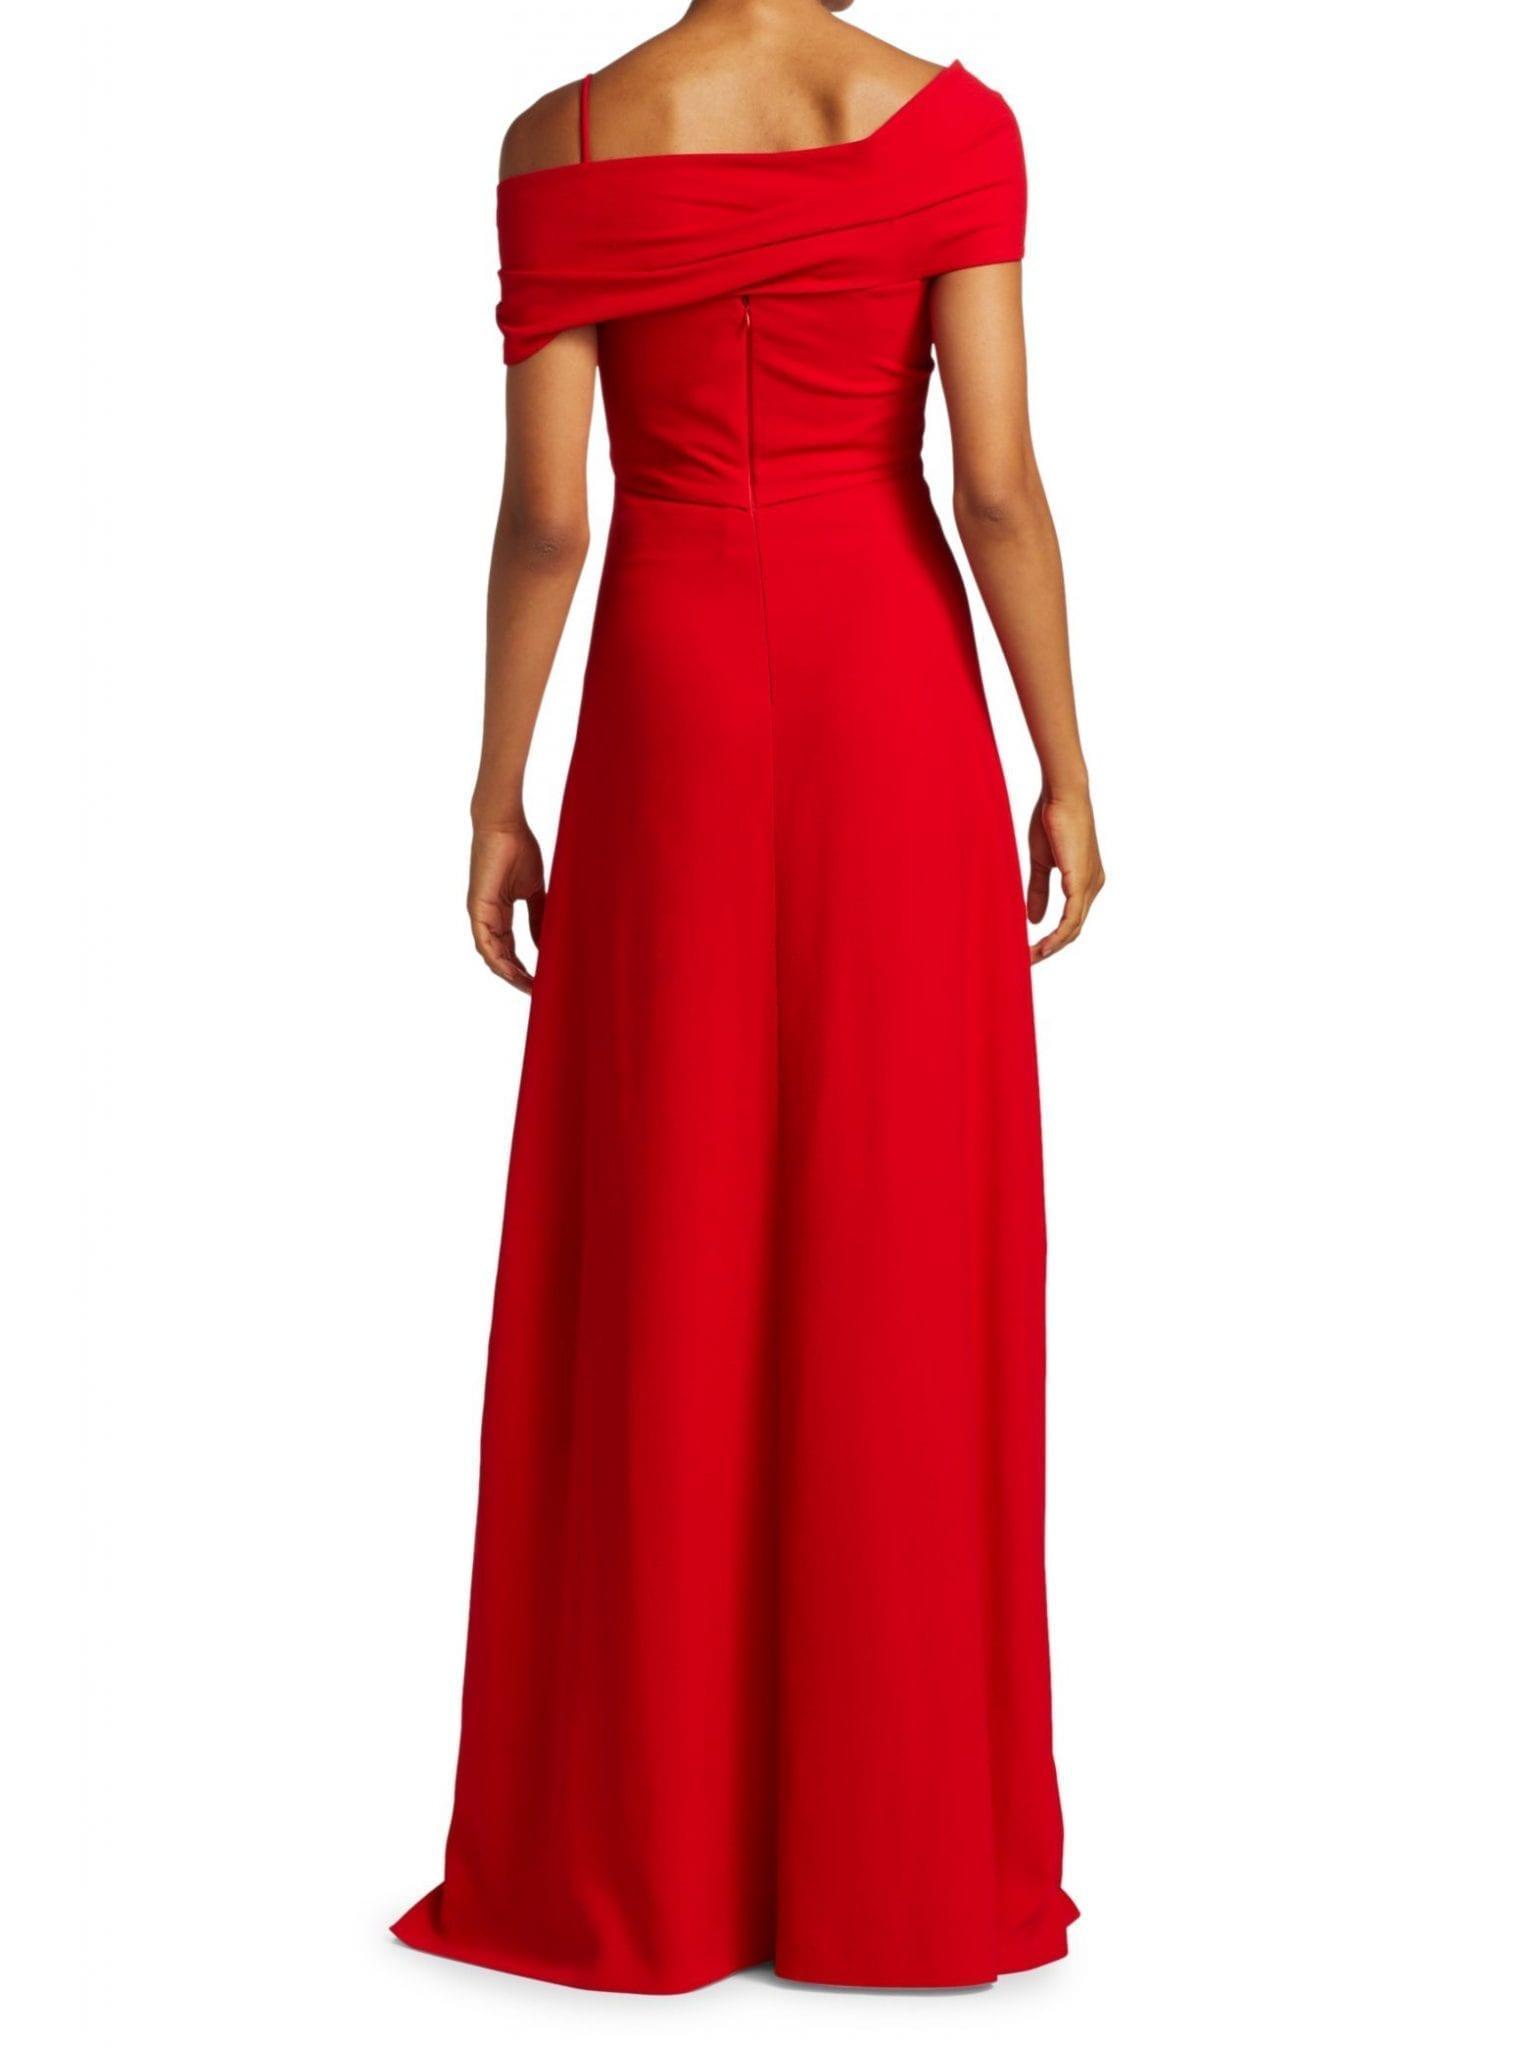 GIAMBATTISTA VALLI Off-The-Shoulder Wrapped Gown